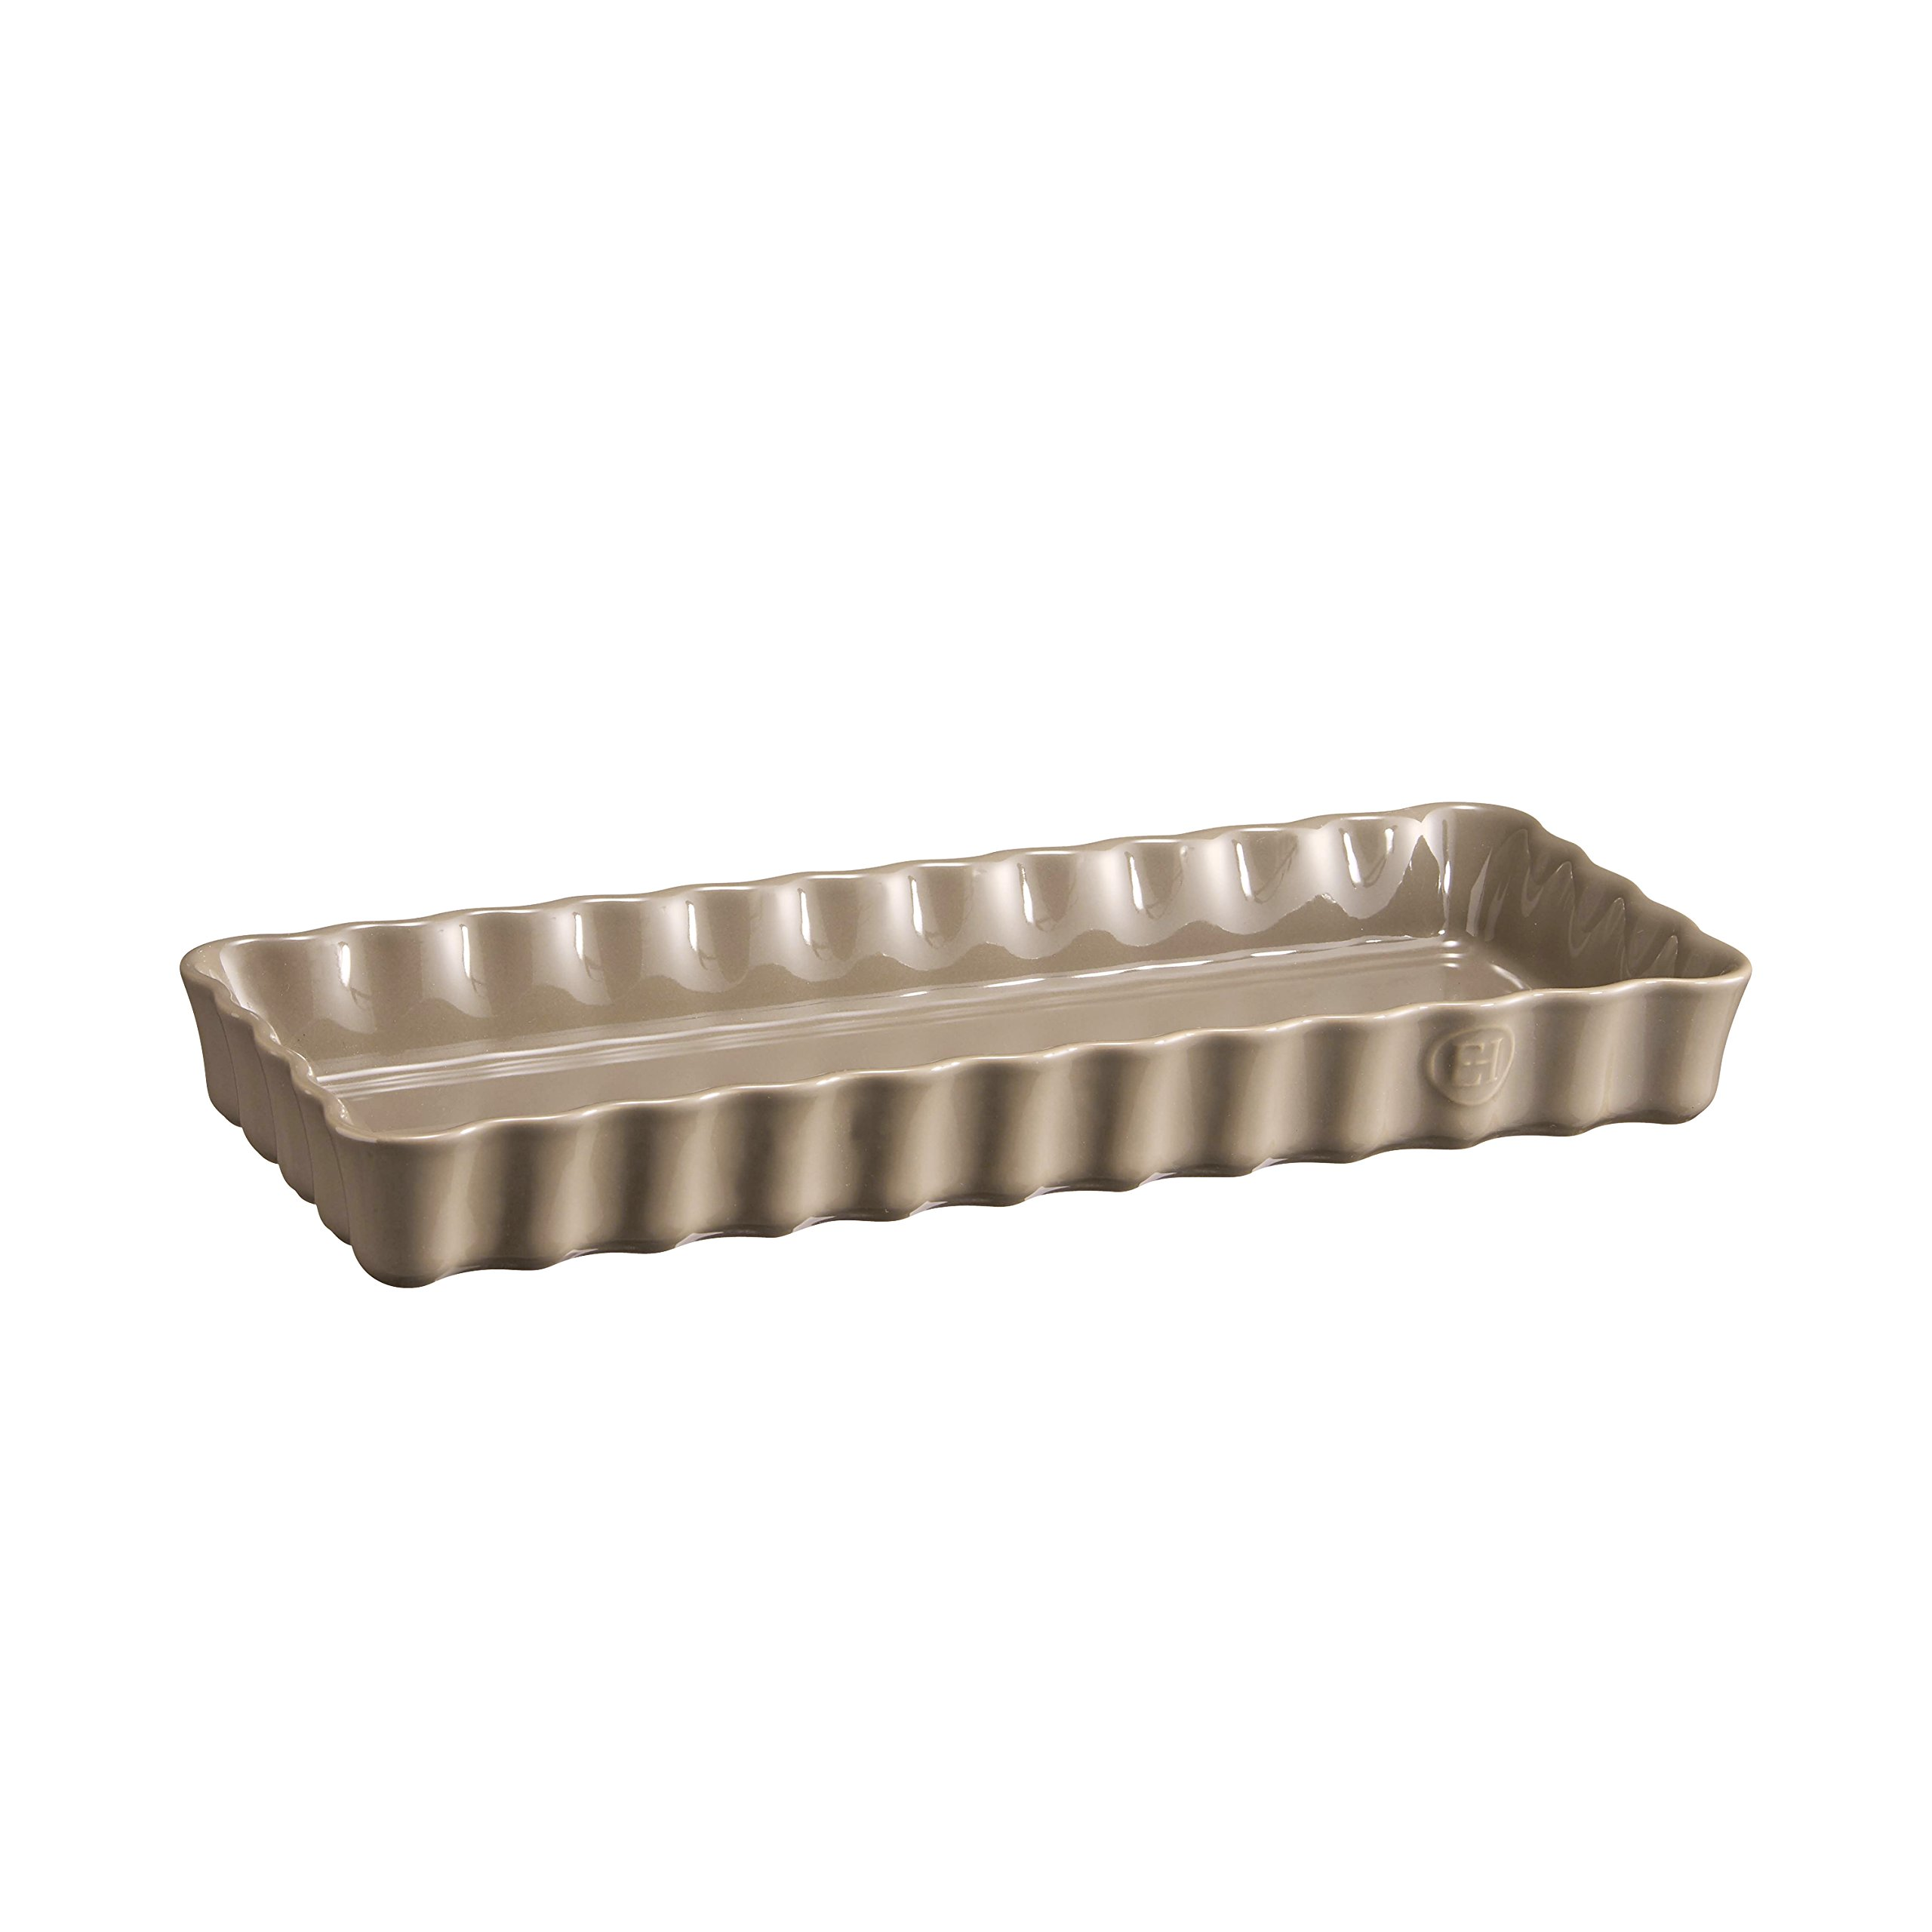 Emile Henry 956034 Slim Tart Dish, 1.4 Quart, Flint